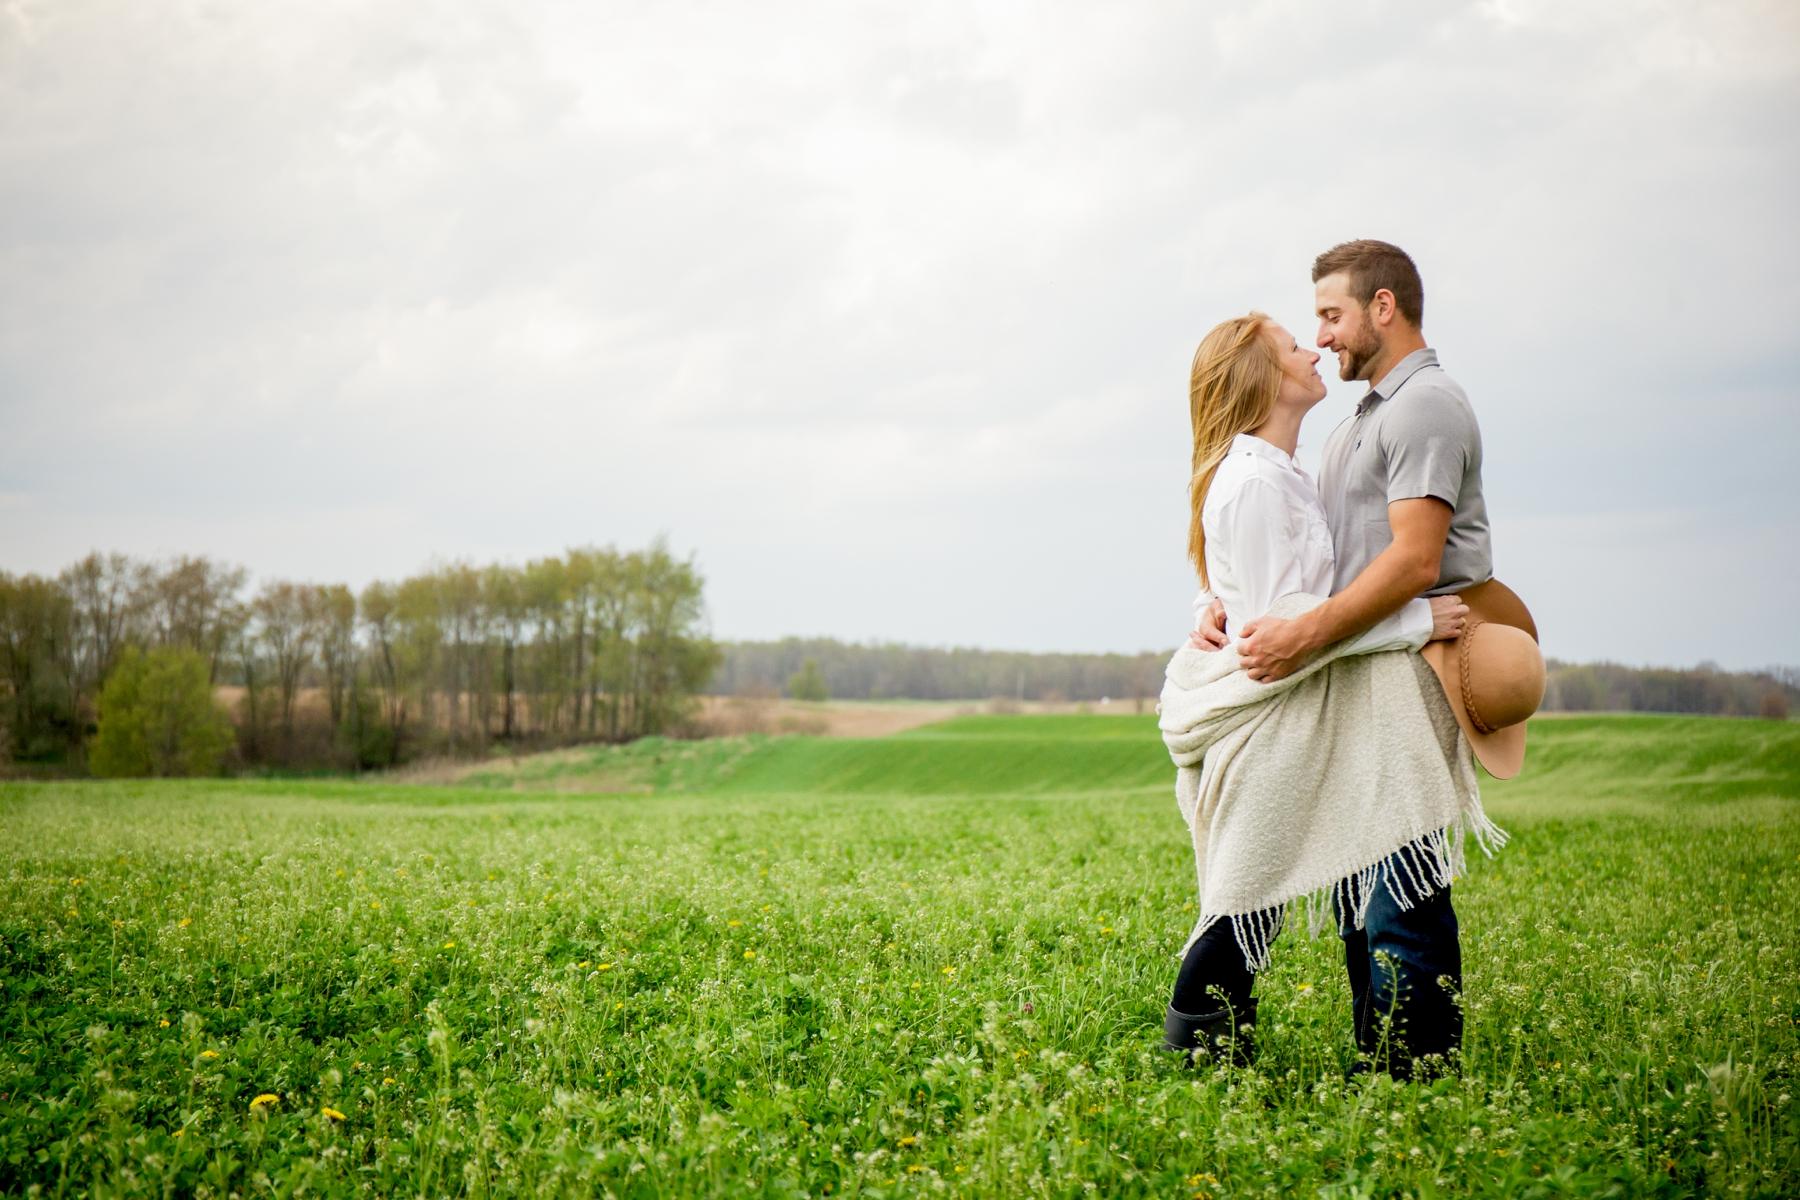 Brandon_Shafer_Photography_Shane_Ashley_Greenhouse_Farm_Michigan_Engagement_0027.jpg